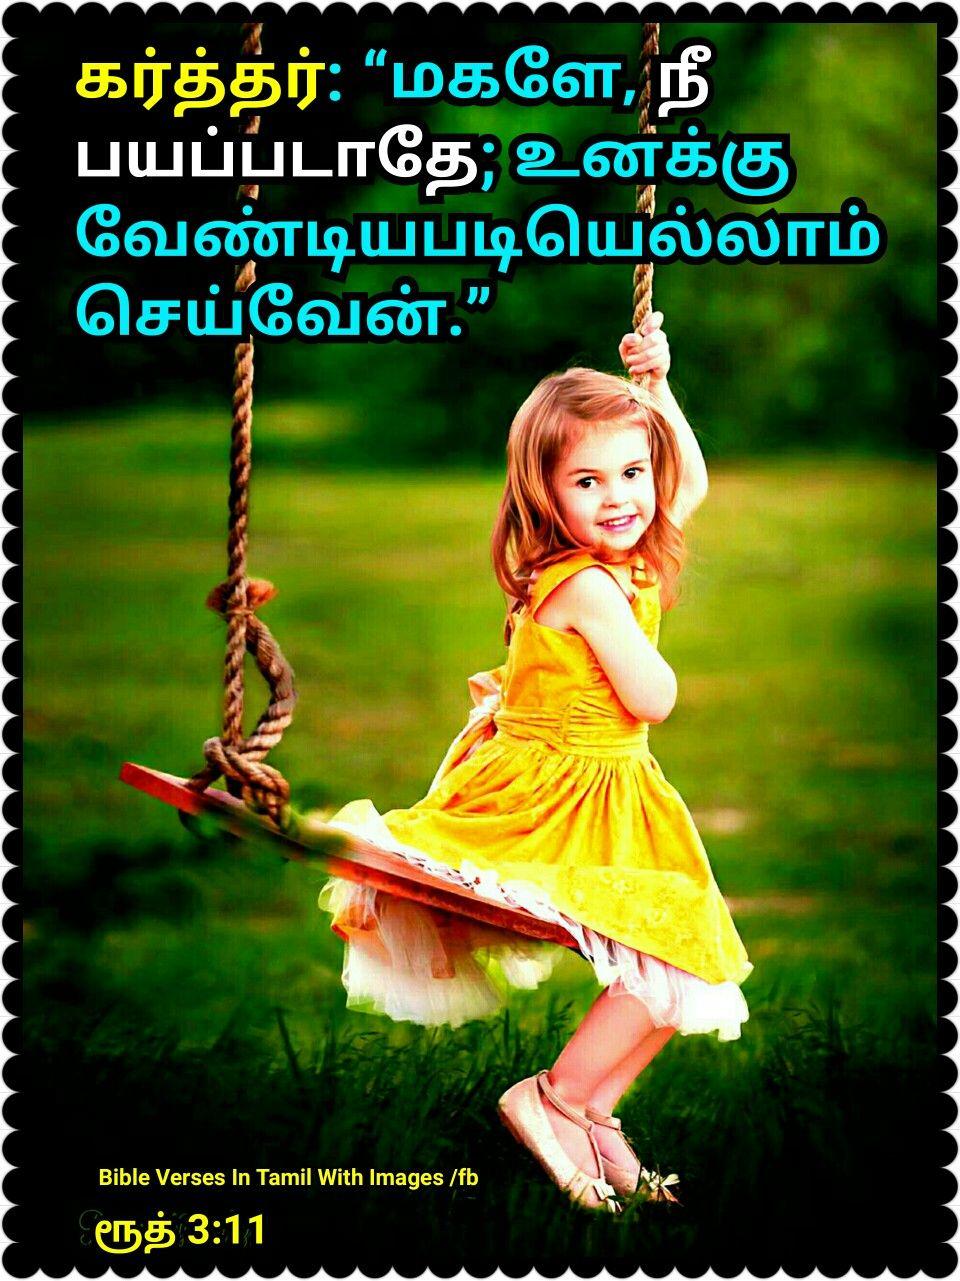 Pin By Rajesh Kumar On Bible Words Bible Words Tamil Bible Words Christian Verses